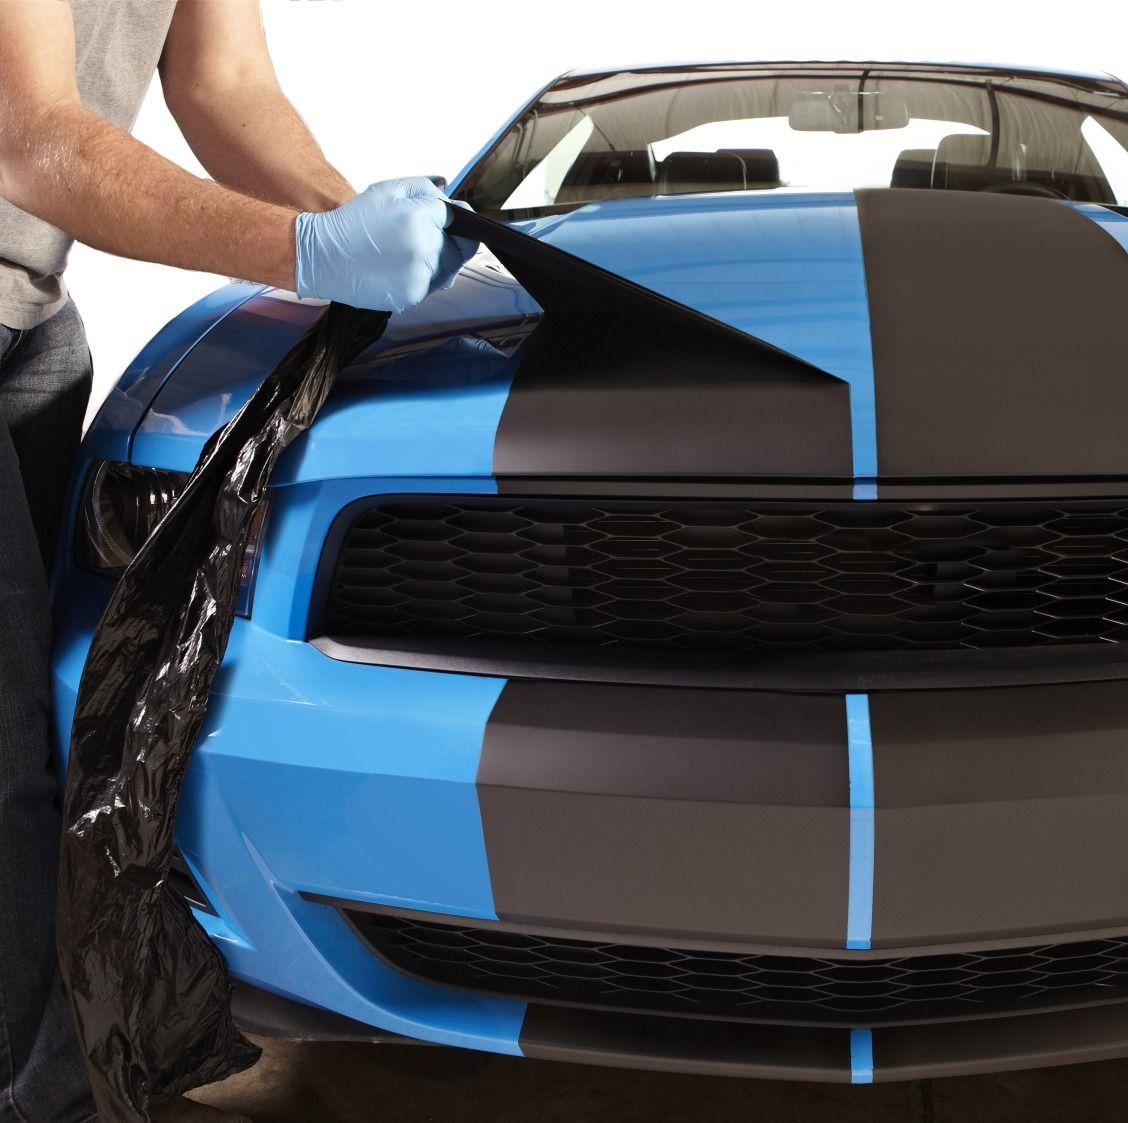 Car Spray Kit Matte: Customize Your Car With Rust-Oleum® Peel Coat Spray Paint